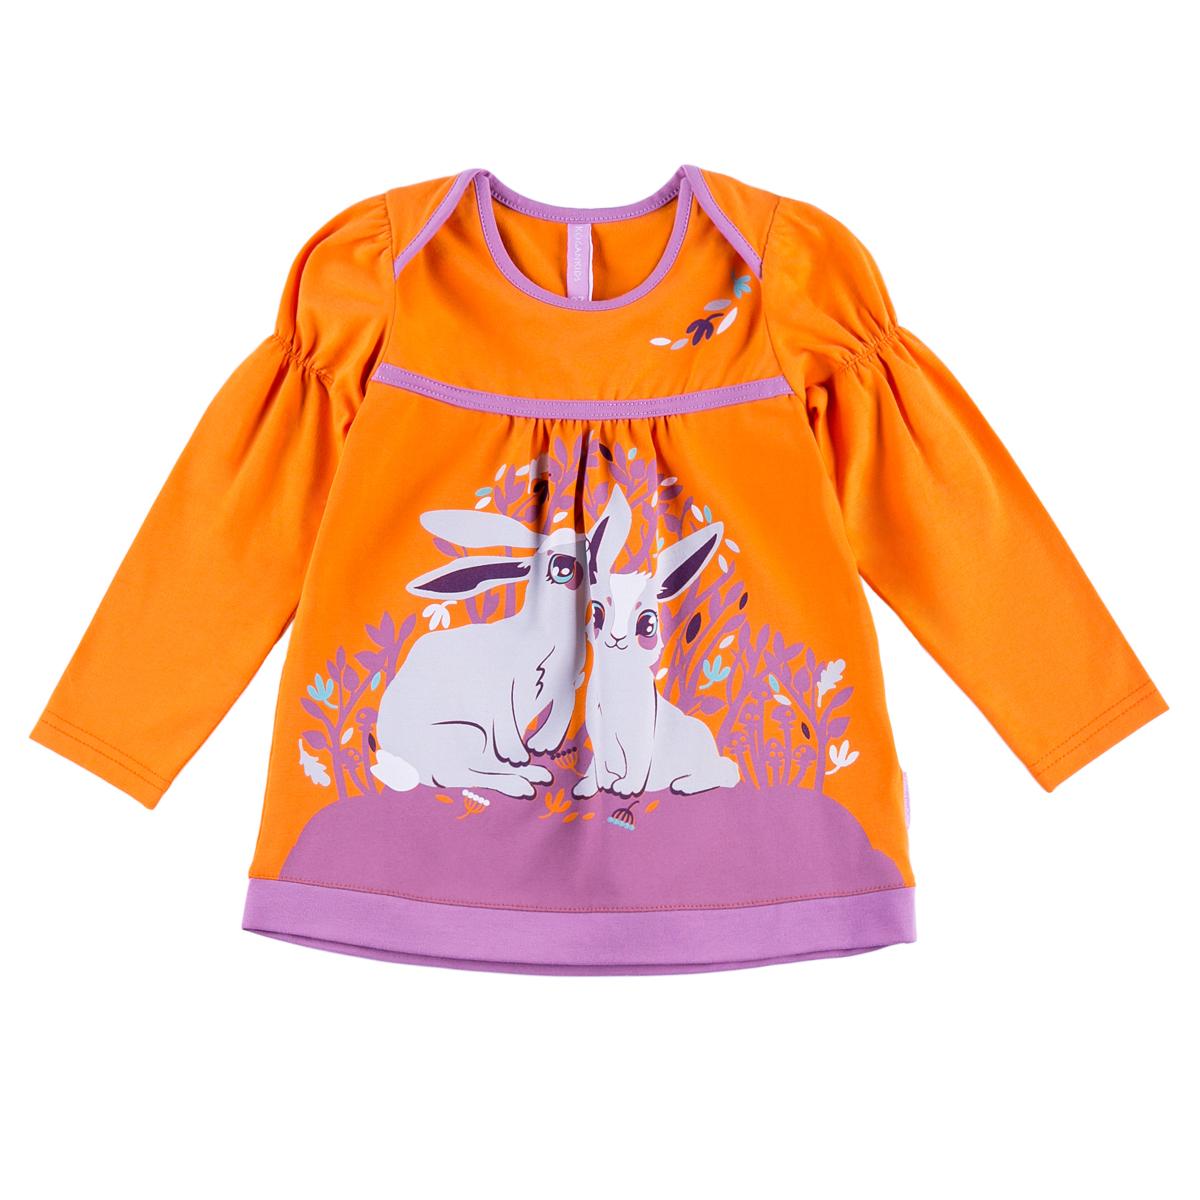 Джемпер Kogankids<br>Размер: 80, 86, 92, 98; Цвет: Оранжевый;